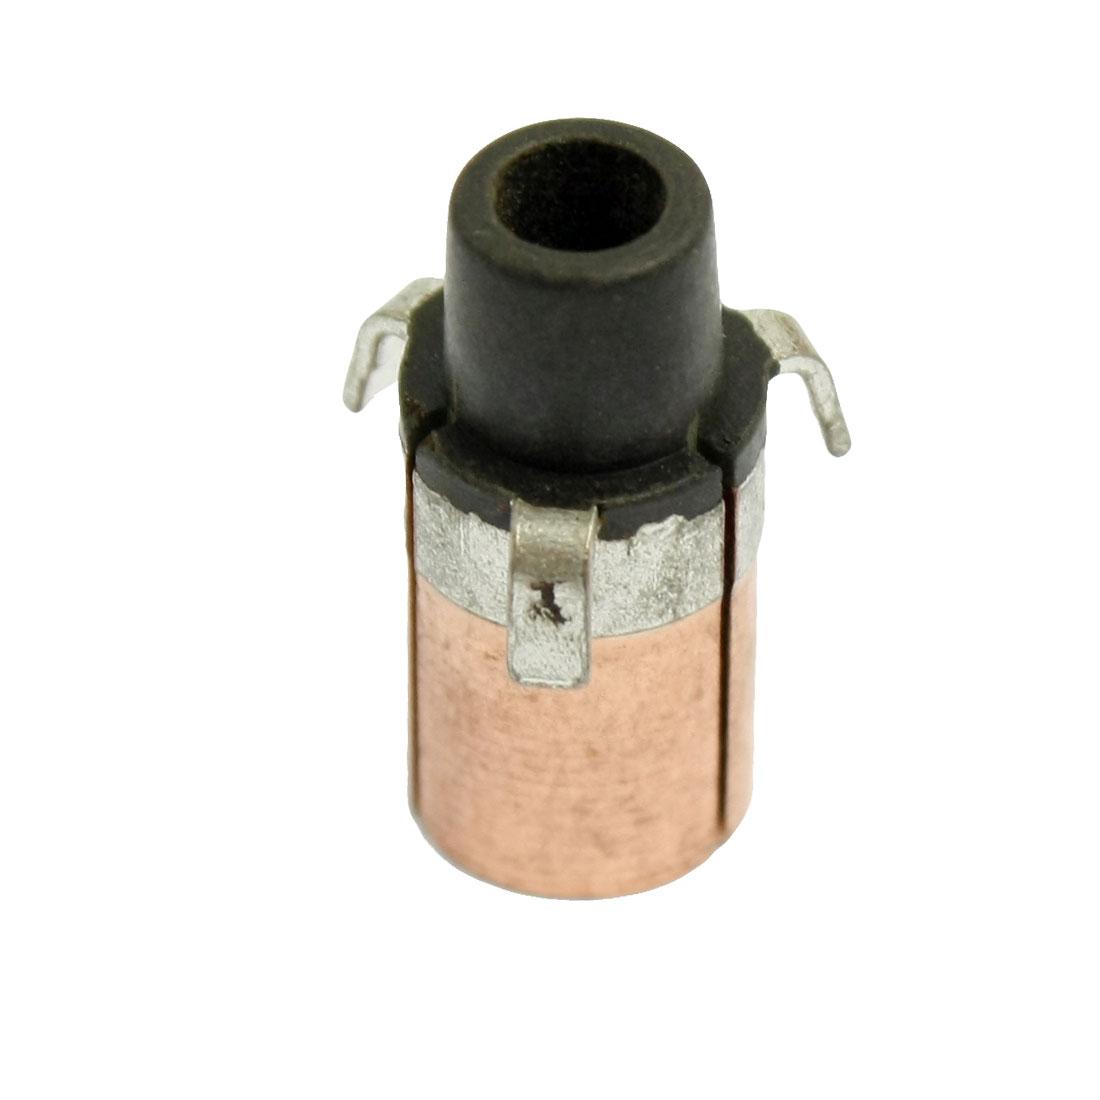 3.175mm x 7.6mm x 16.8mm Copper Case Auto Alternator Motor Power Tool Commutator